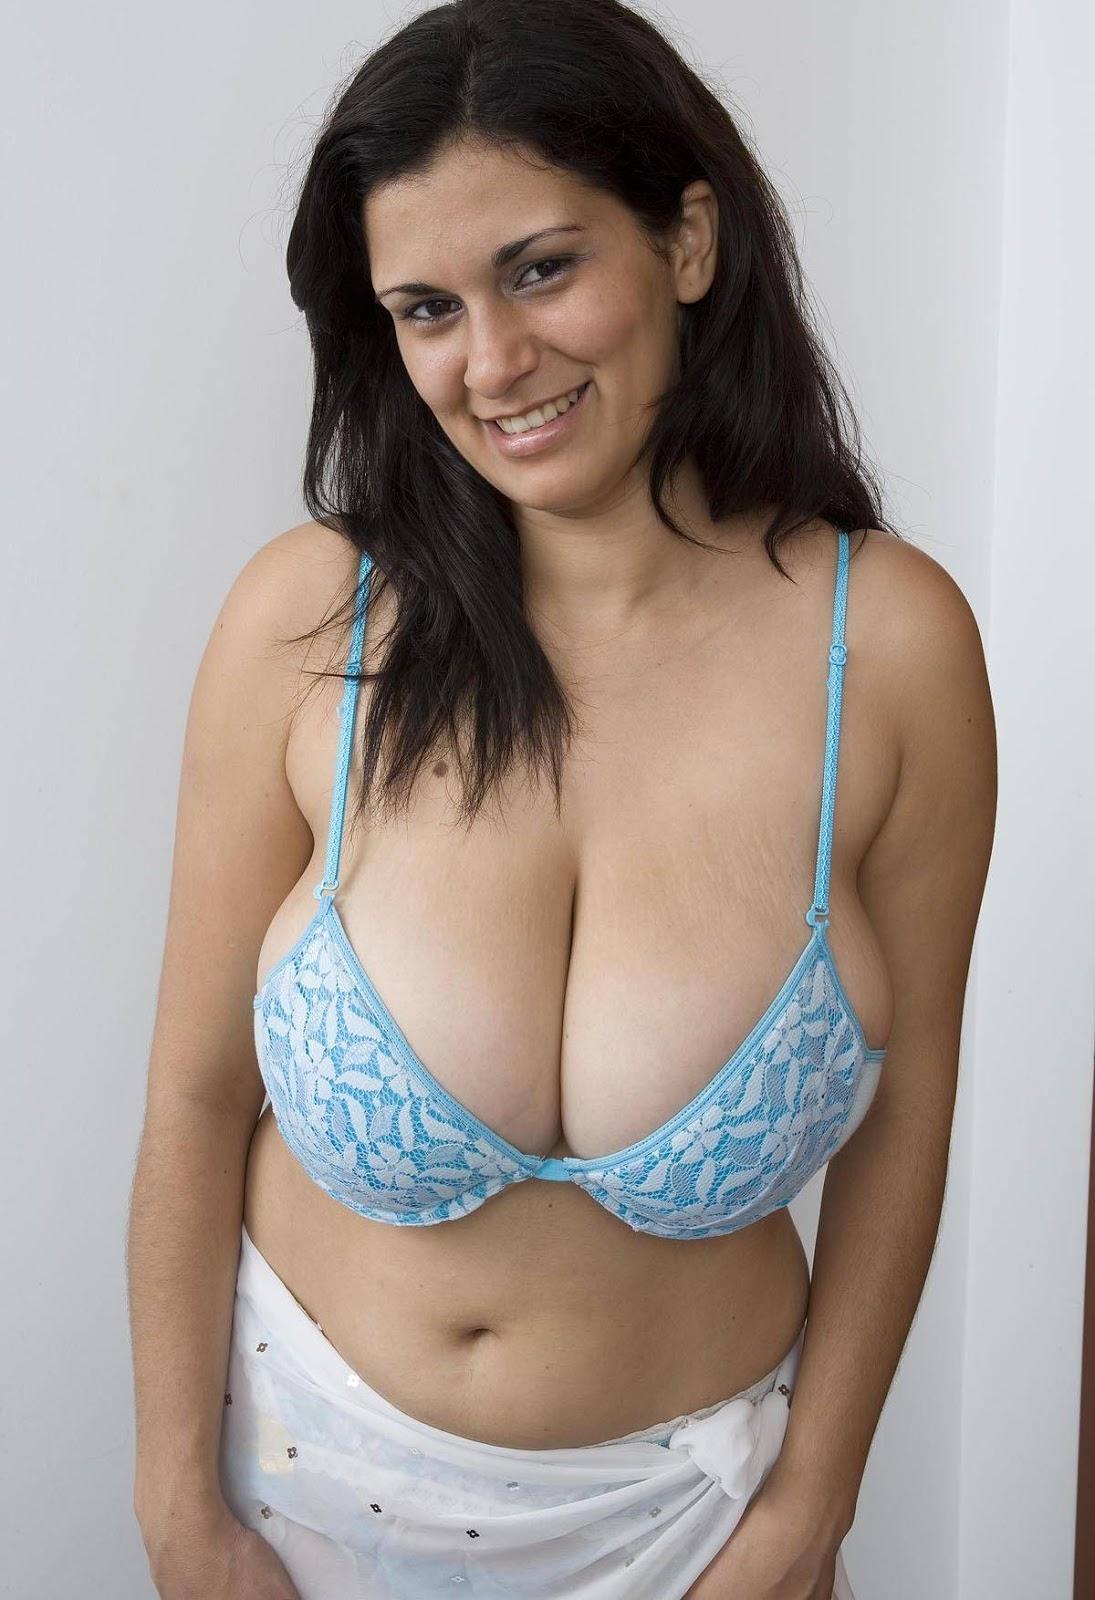 Terry Nova Huge Boobs